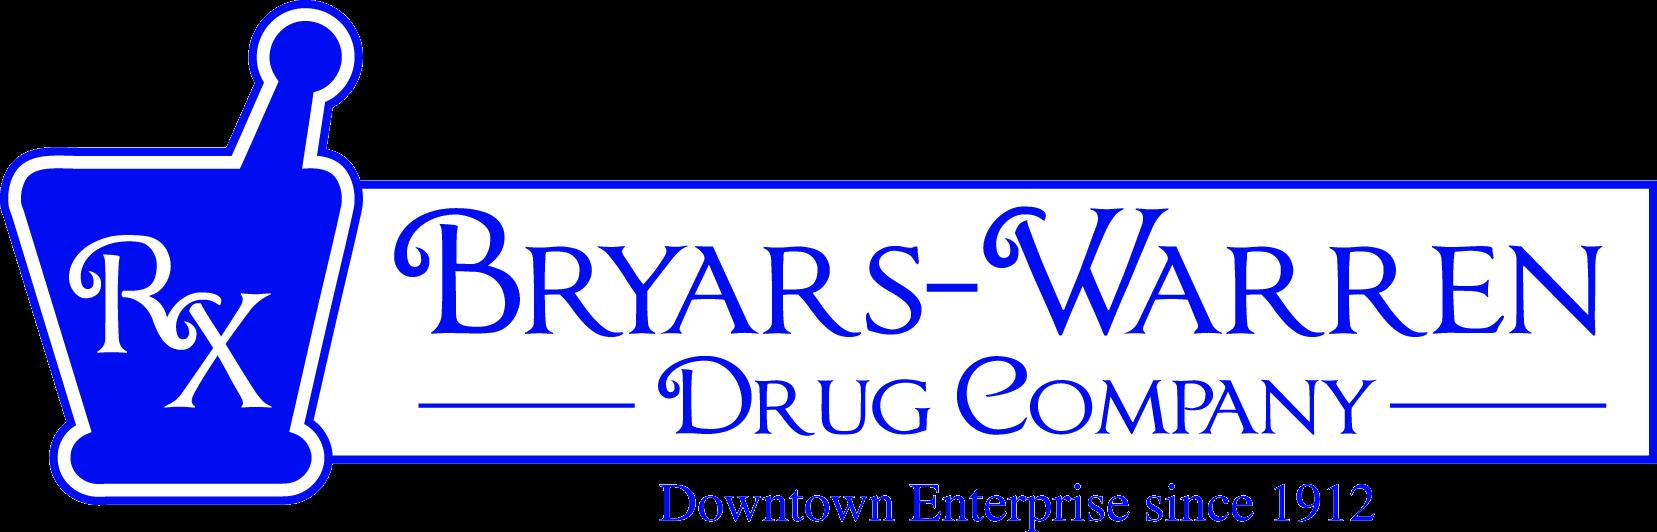 Bryars-Warren Drug Co